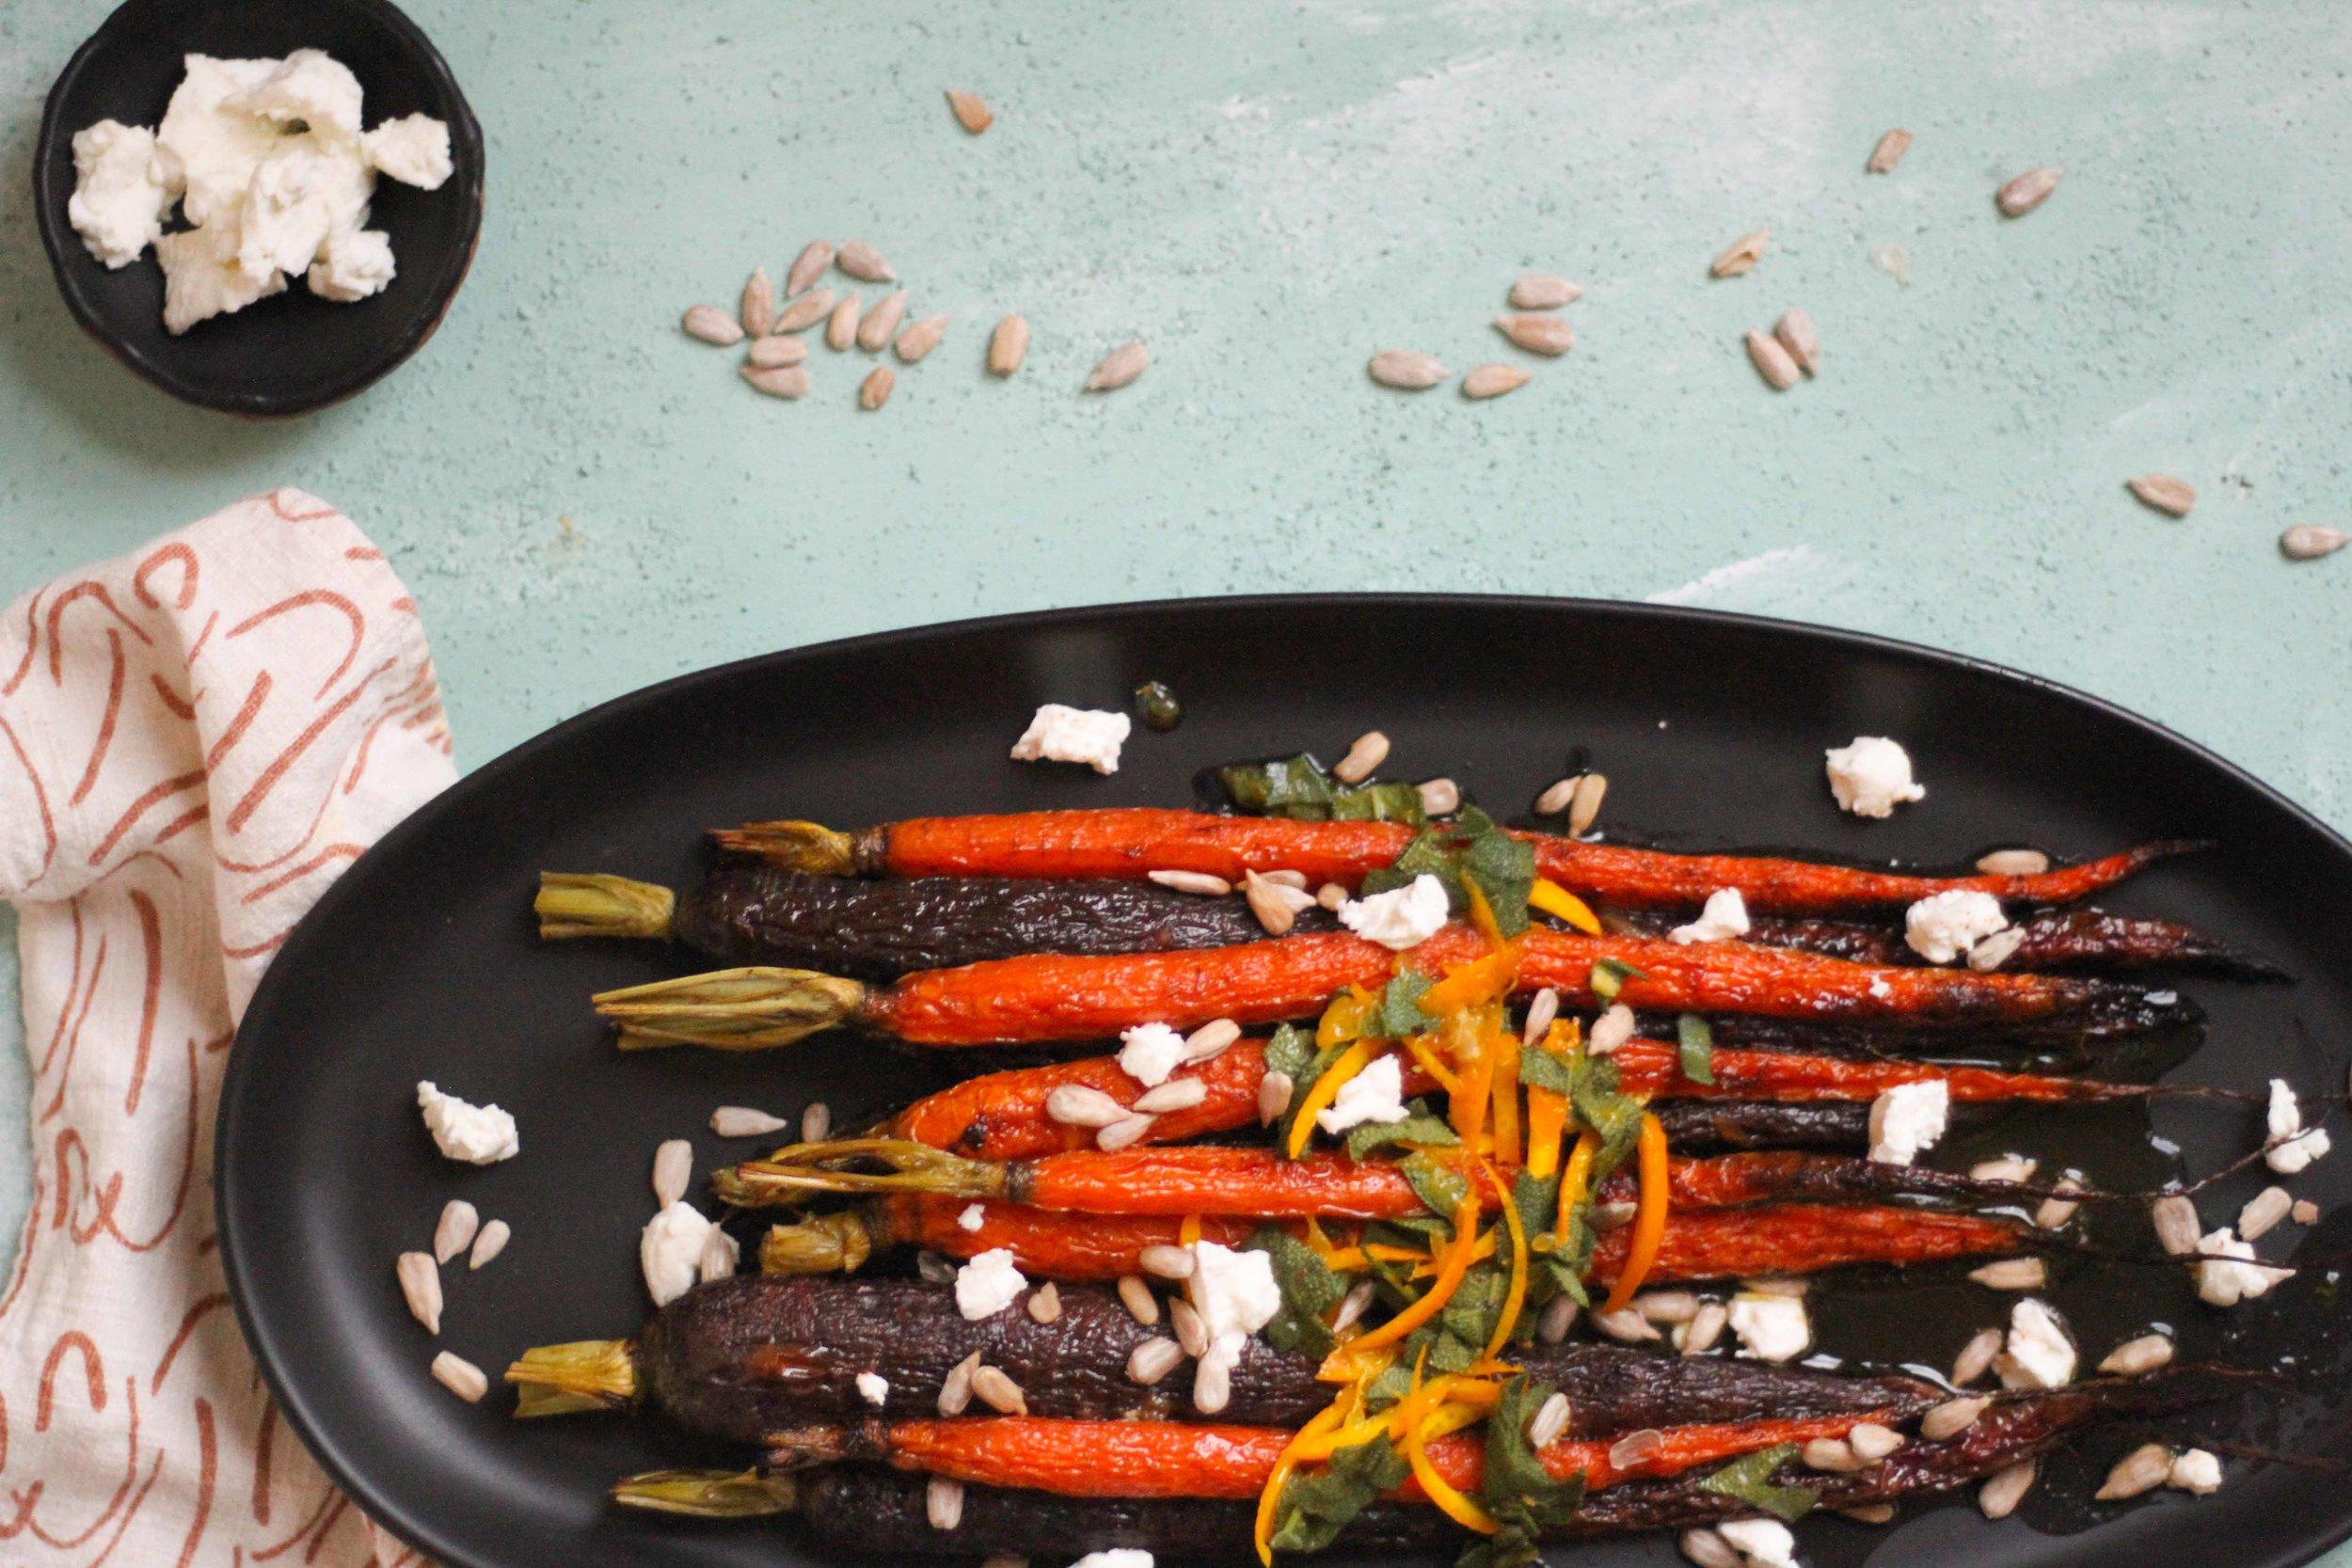 Roasted carrots with sage vinaigrette